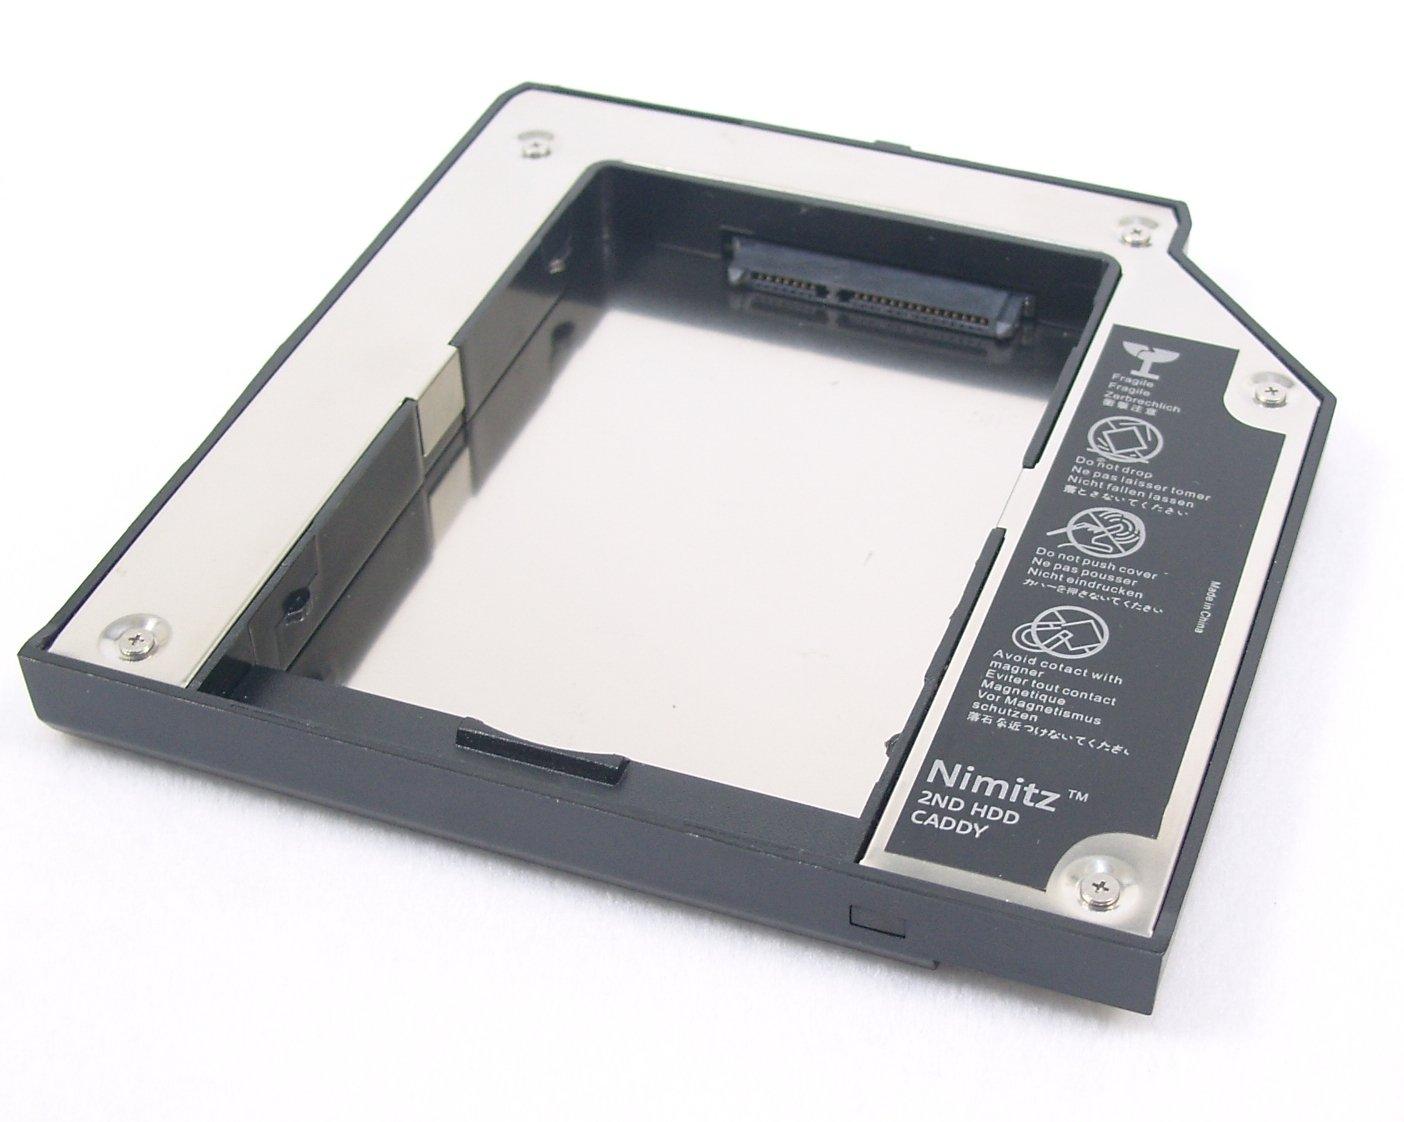 Nimitz 2nd Hdd Ssd Hard Drive Caddy For Lenovo Thinkpad T420 T430 T510 T520 T530 W510 W520 W530 Computers Accessories